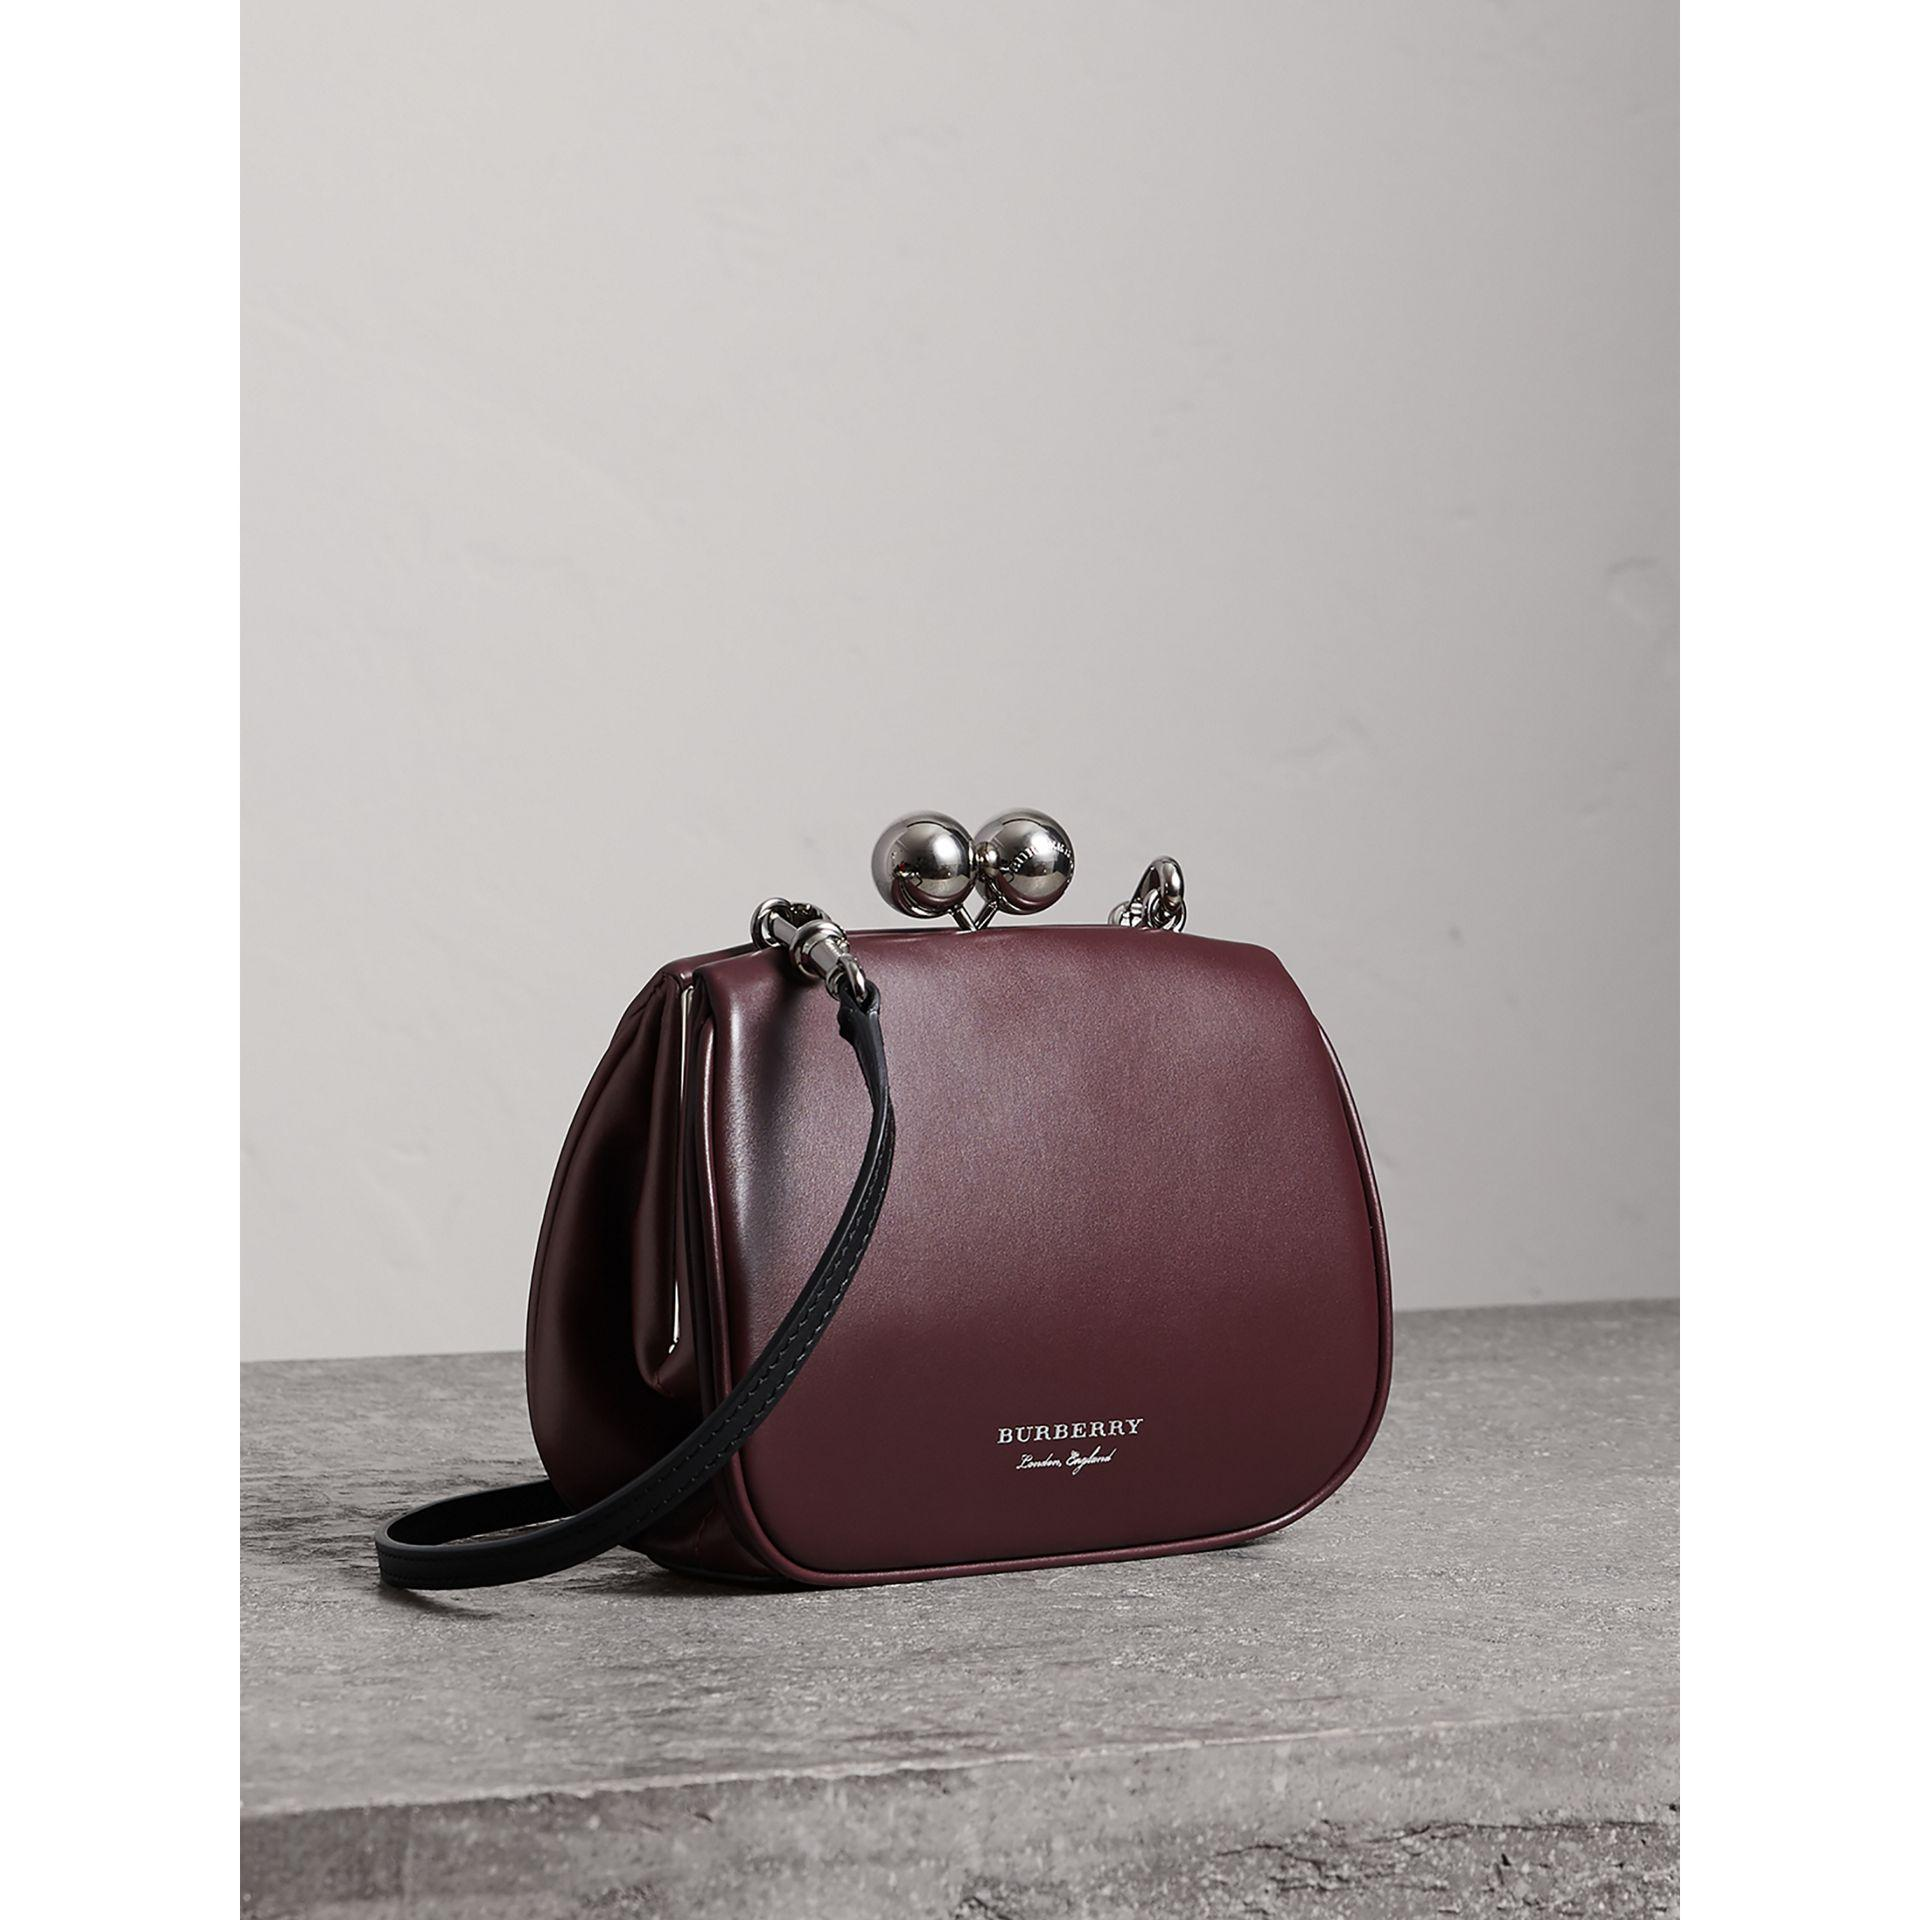 6a36898a4eaf Lyst - Burberry Small Leather Frame Bag